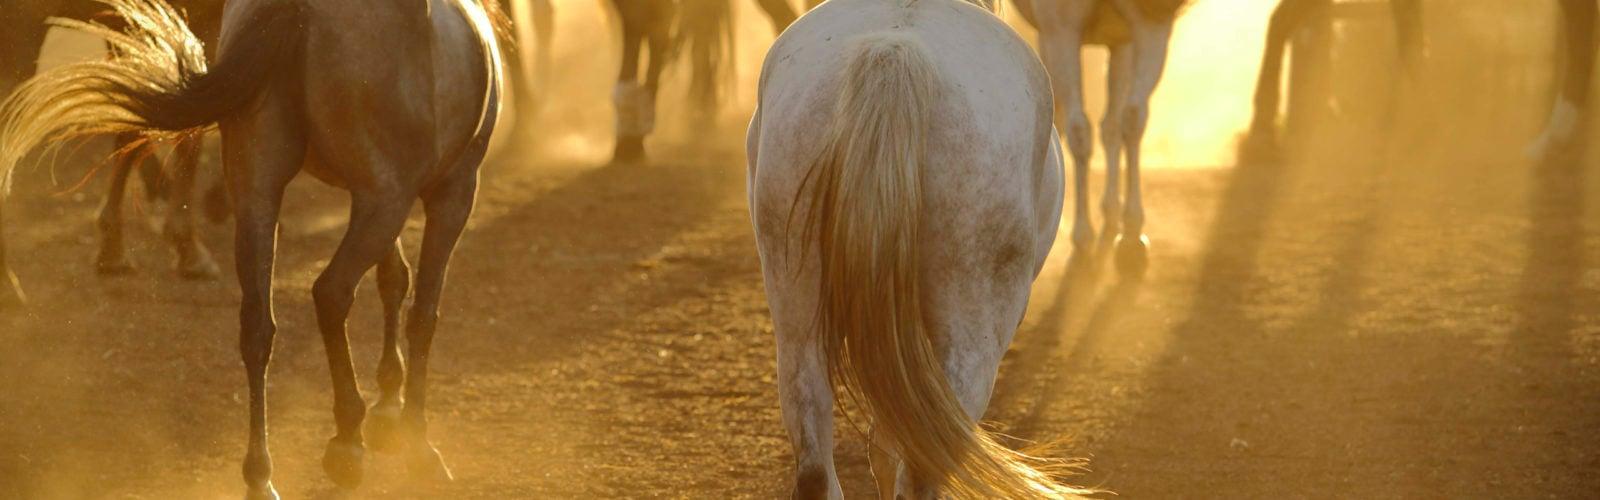 lewa-wilderness-horses